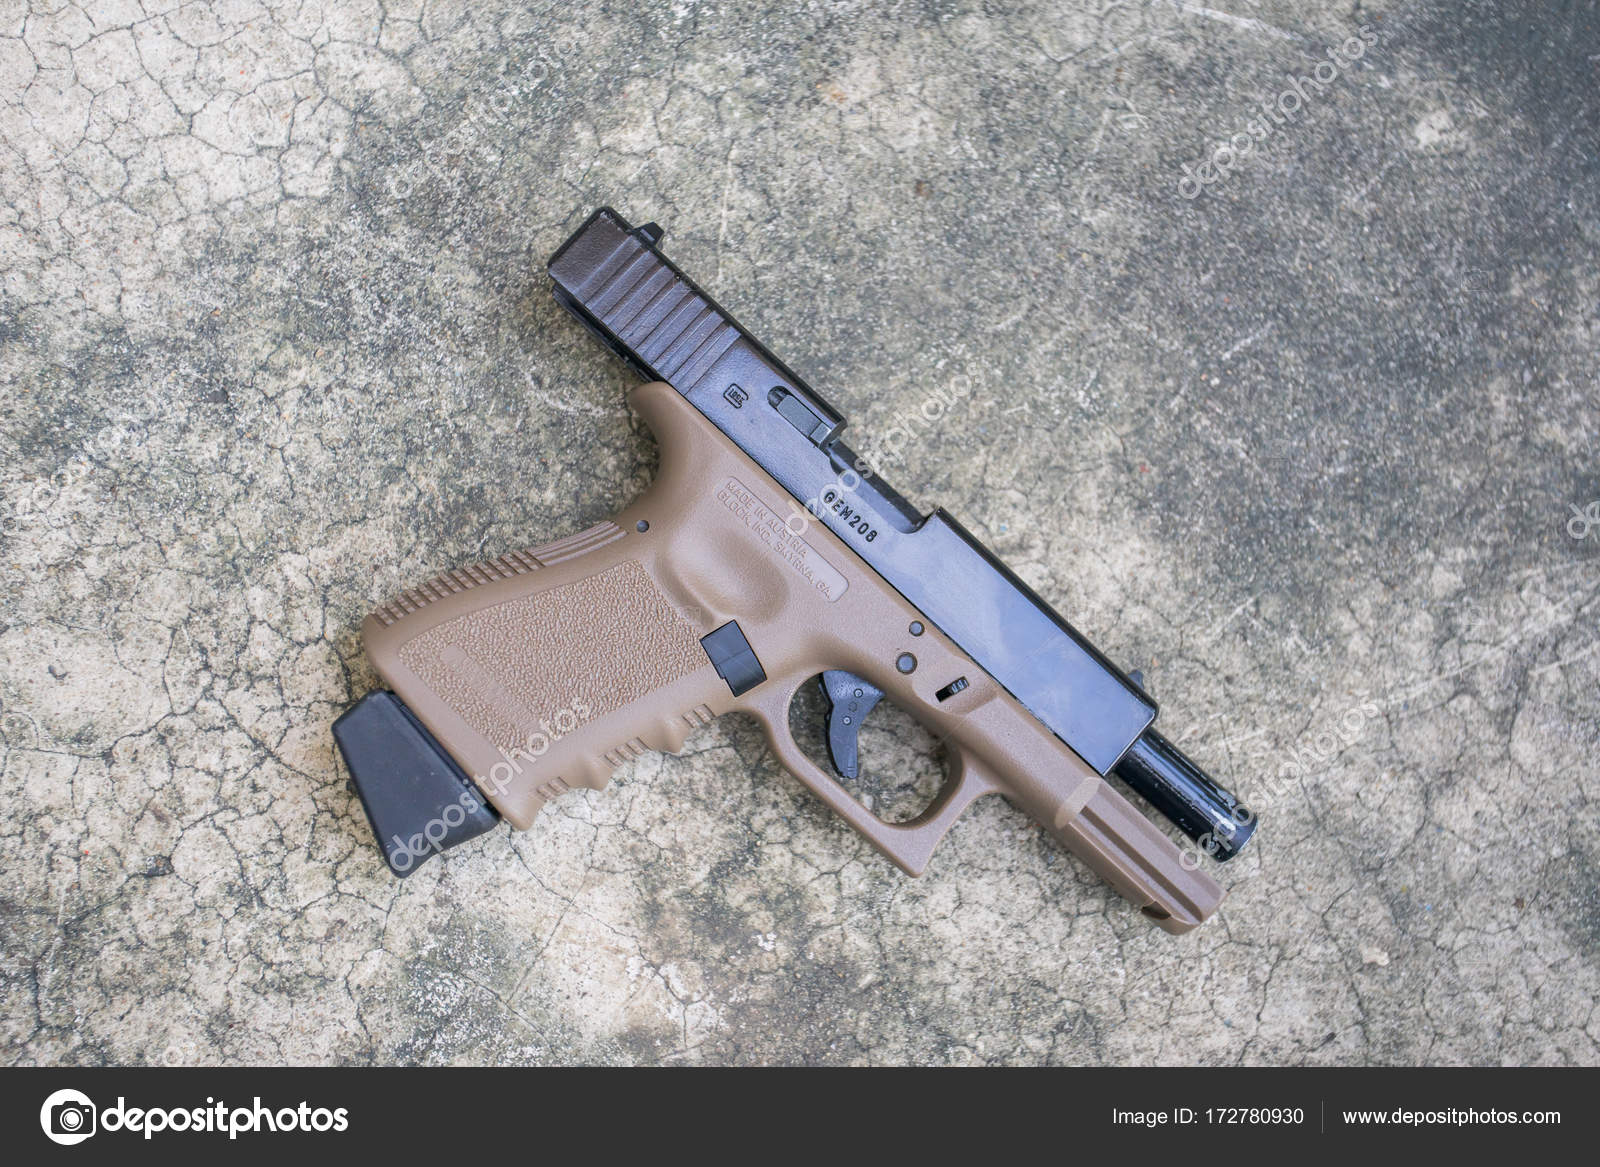 Glock 19 Two Tone Airsoft 6 Mm Bullet Ball Pistol Gun On The Floor